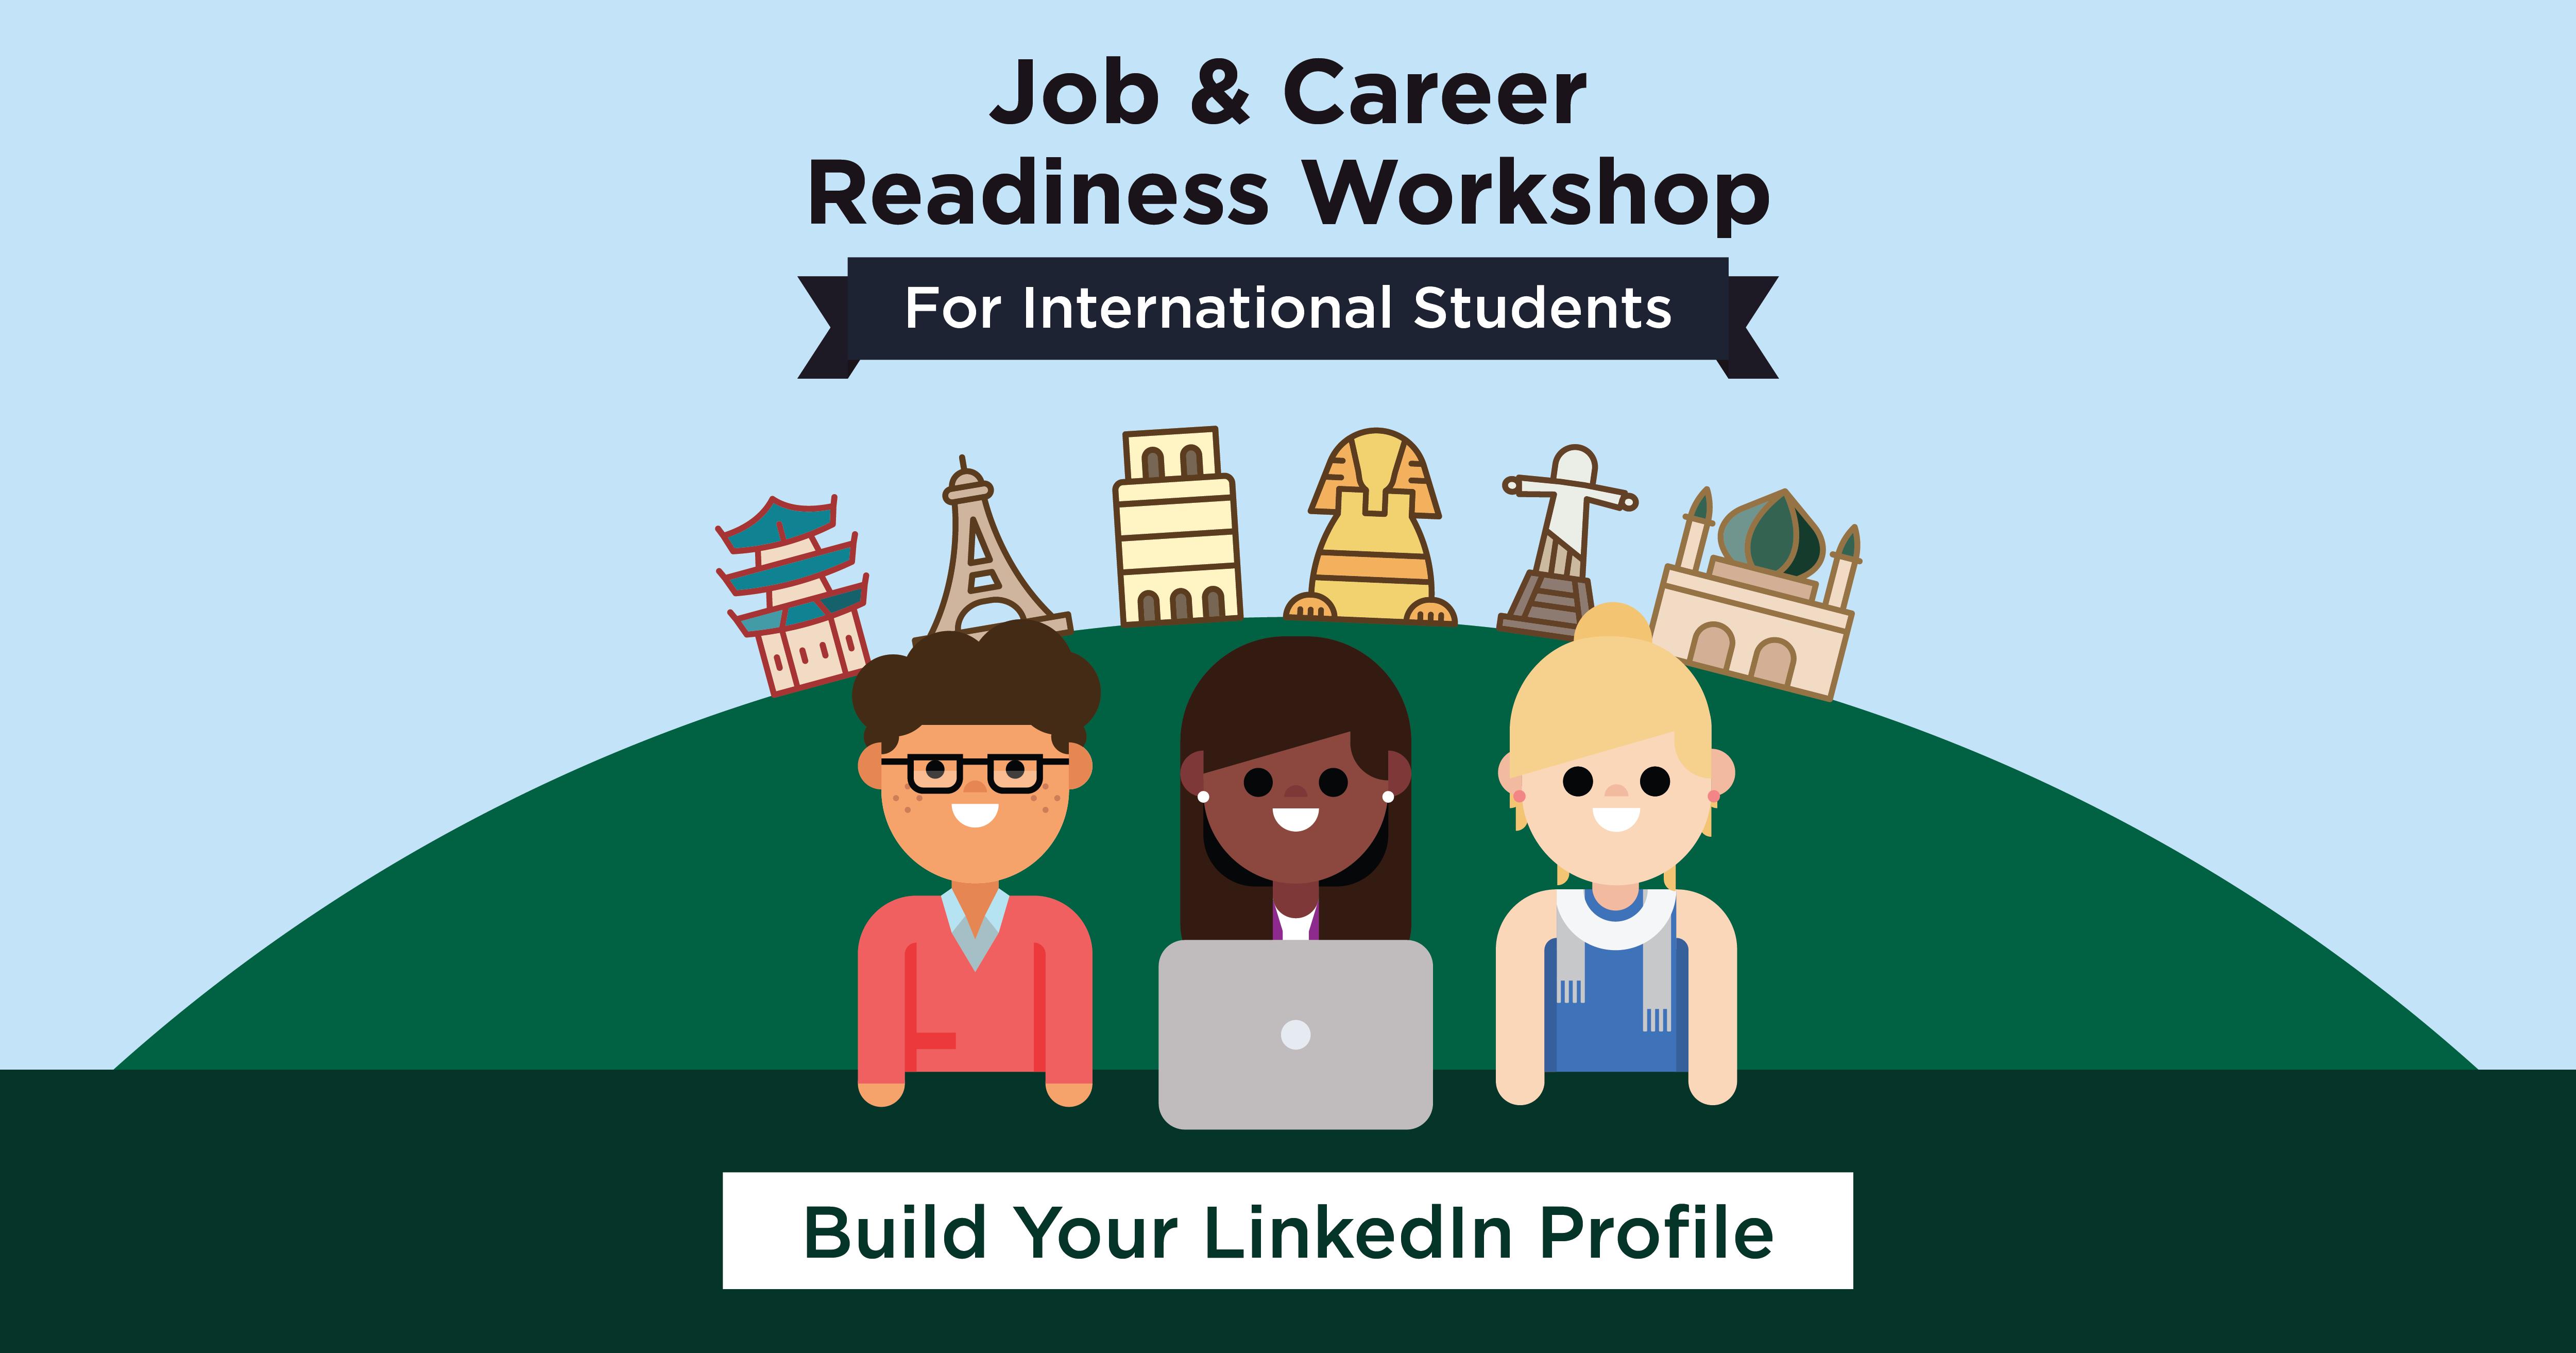 Job & Career Readiness Workshop: Build your LinkedIn Profile